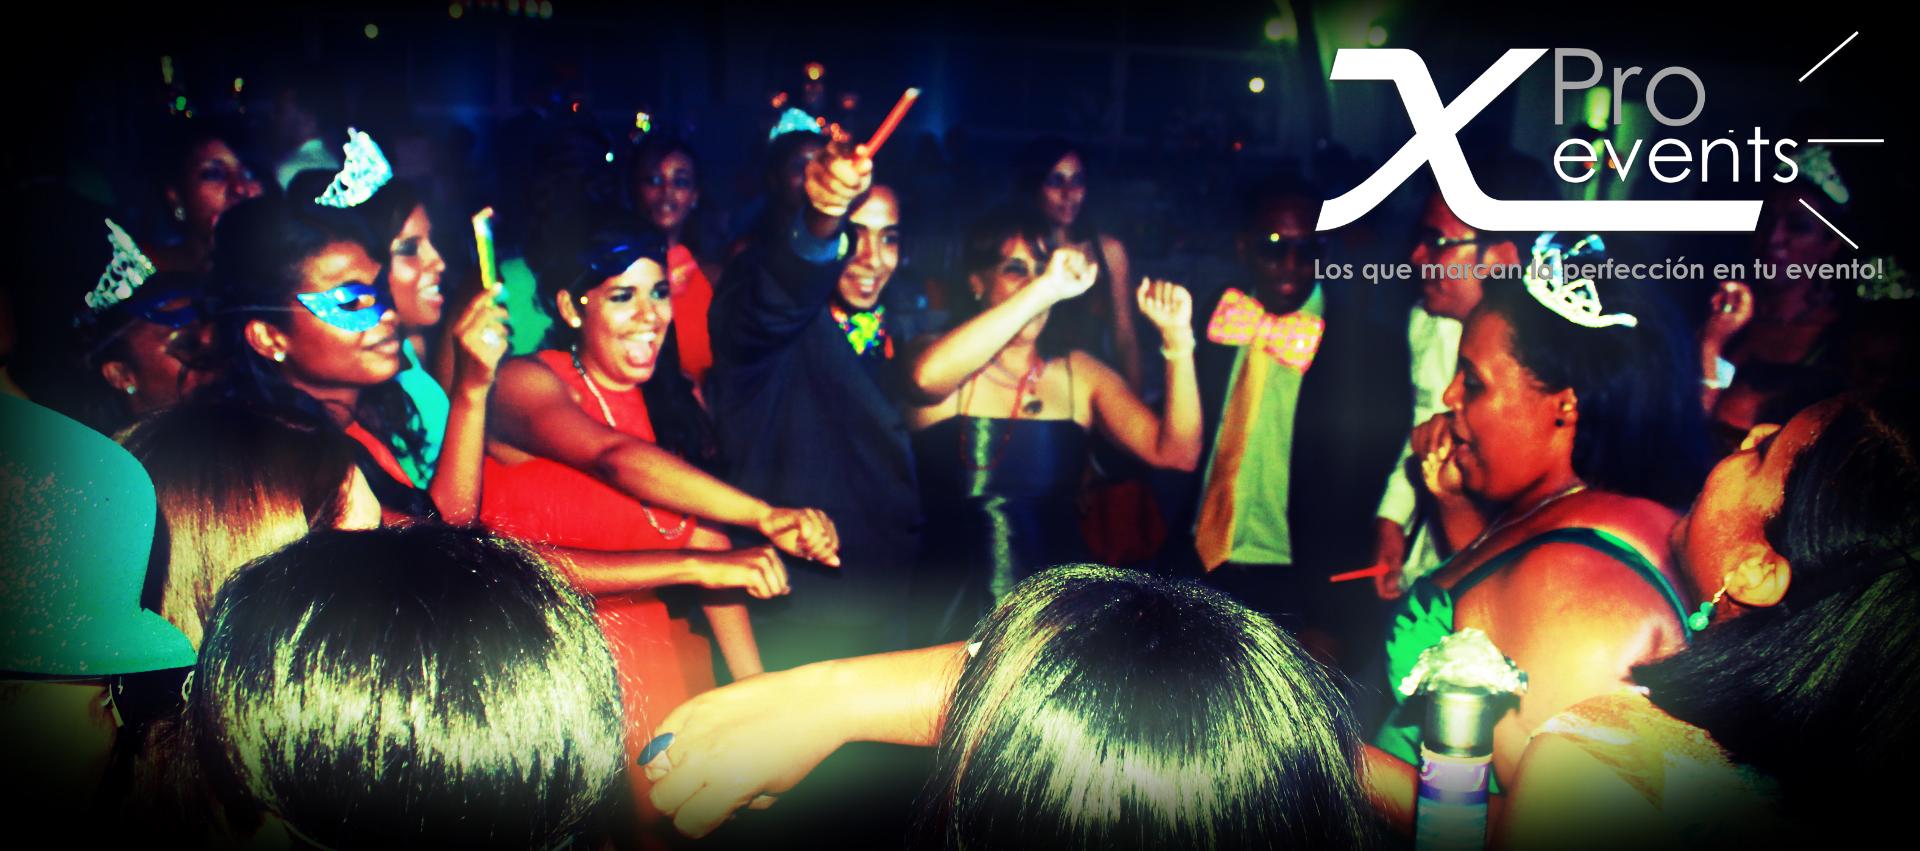 www.Xproevents.com - Tu fiesta inolvidable.JPG